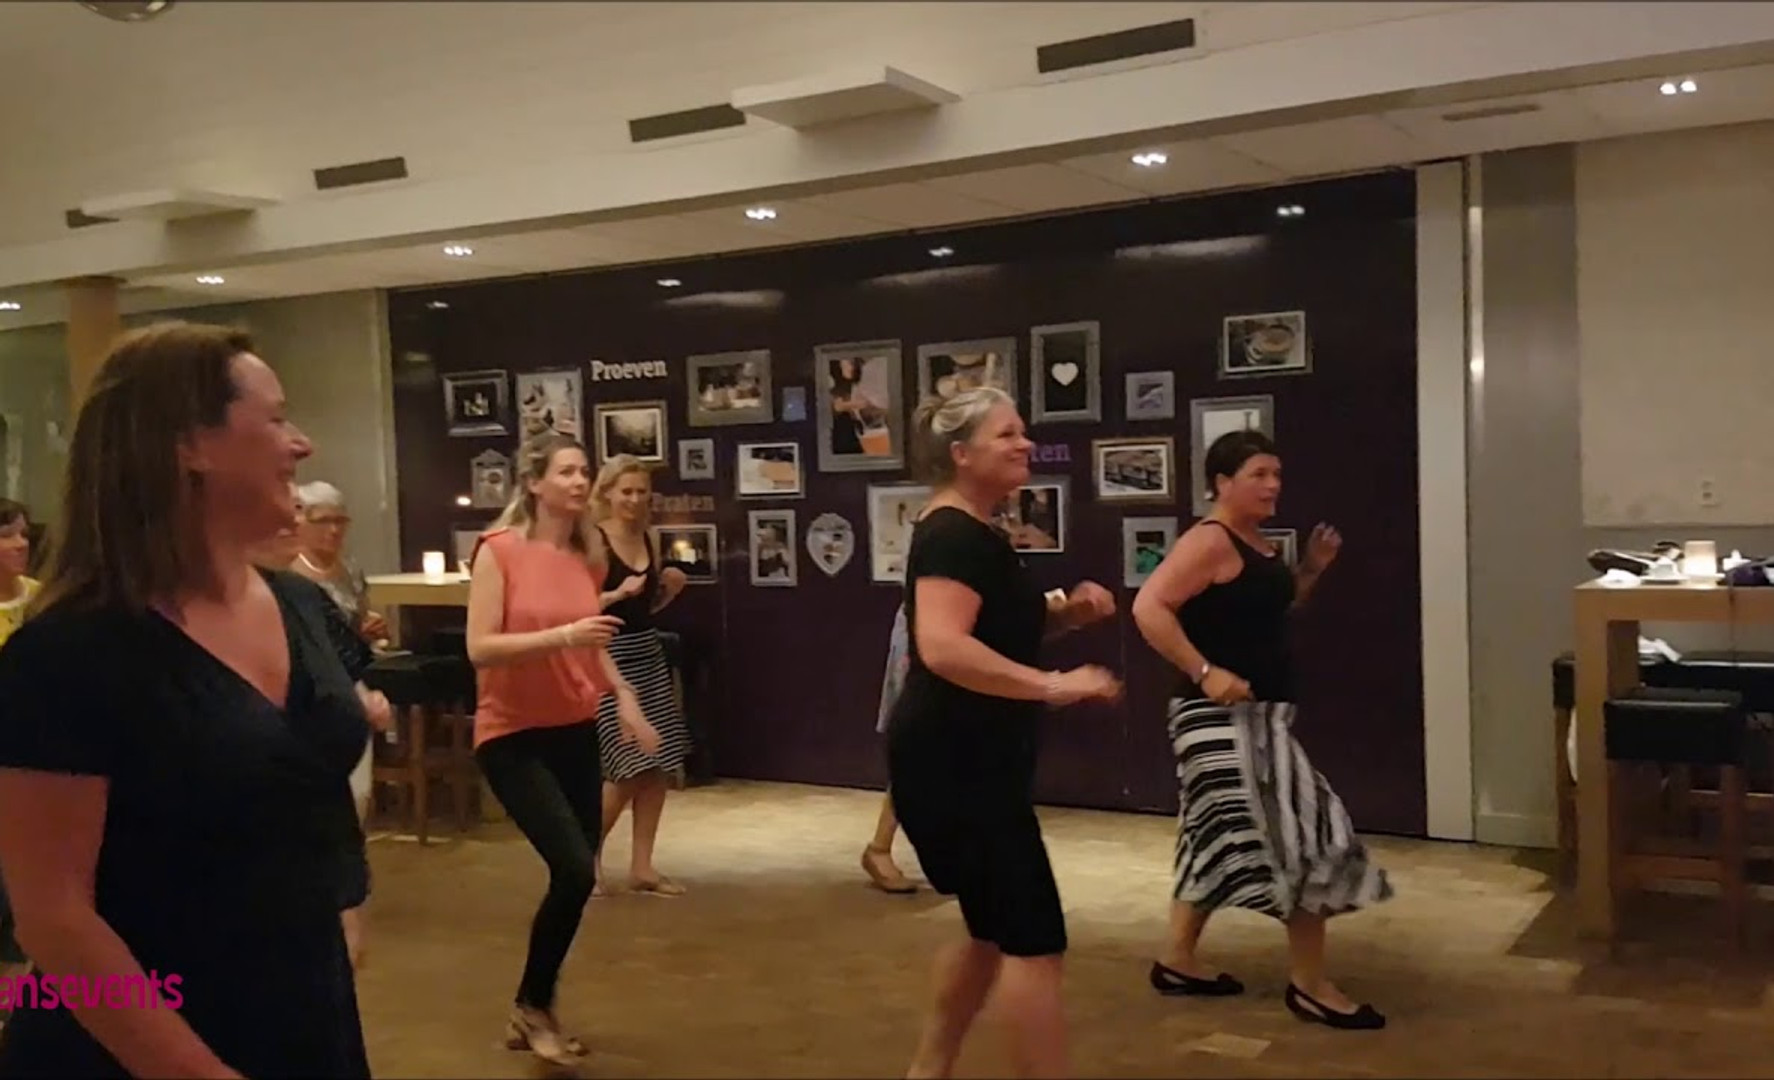 Dansevents video Salsa & Bachata Wervershoof